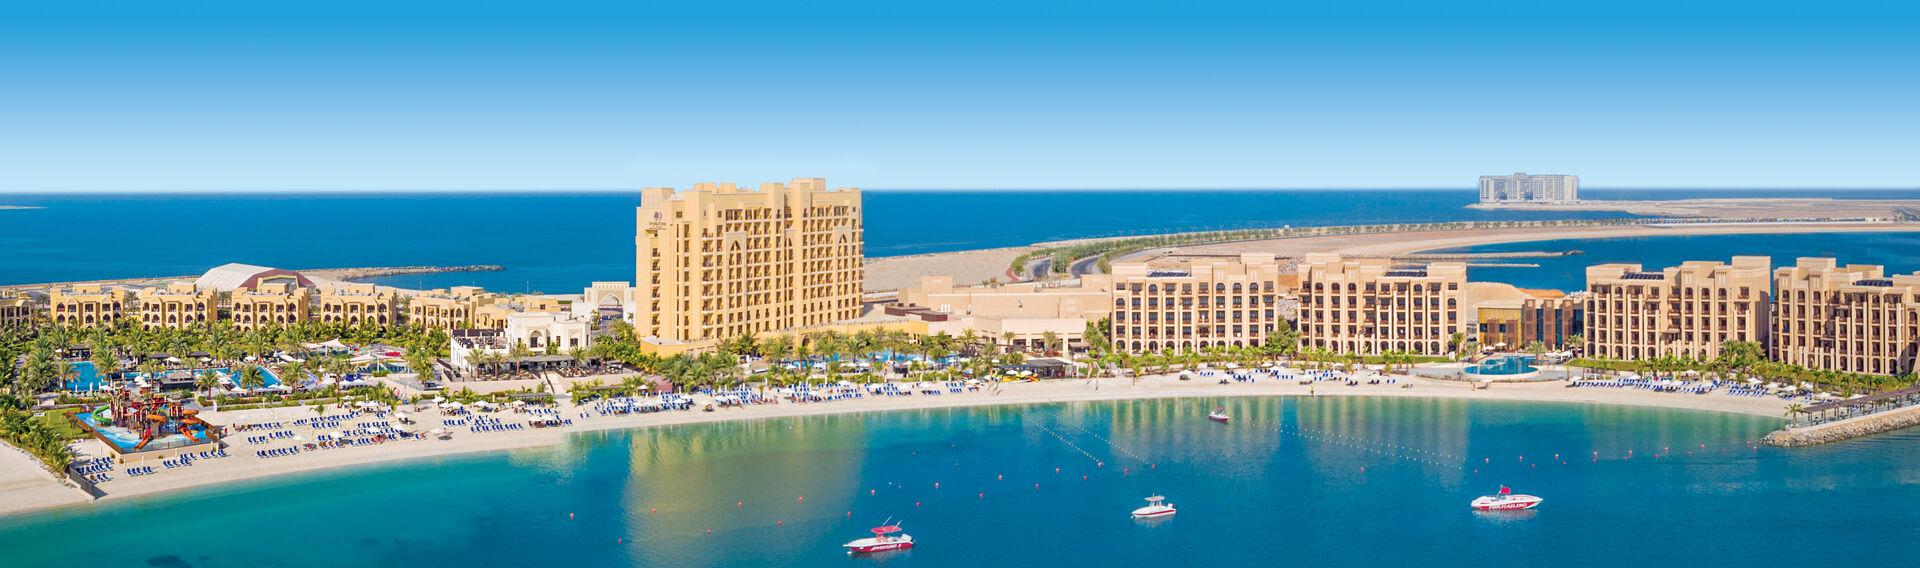 Séjour Ras Al Khaimah - DoubleTree by Hilton Resort & Spa Marjan Island - 5*